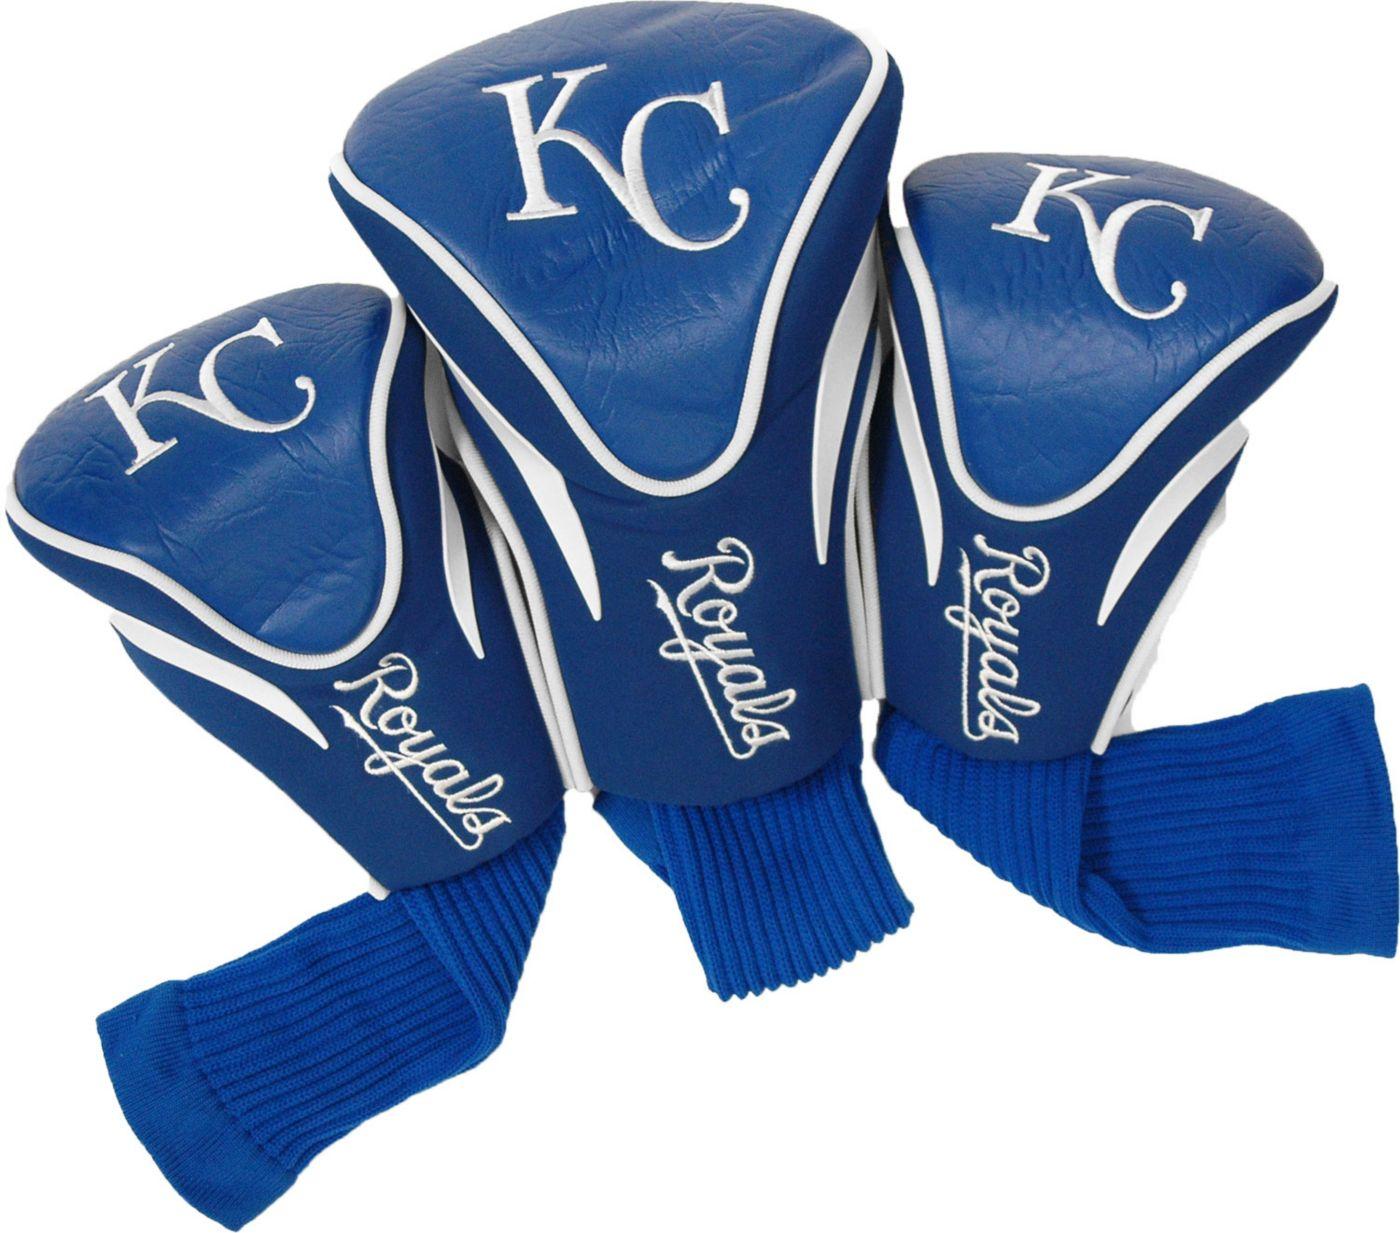 Team Golf Kansas City Royals Contour Sock Headcovers - 3 Pack